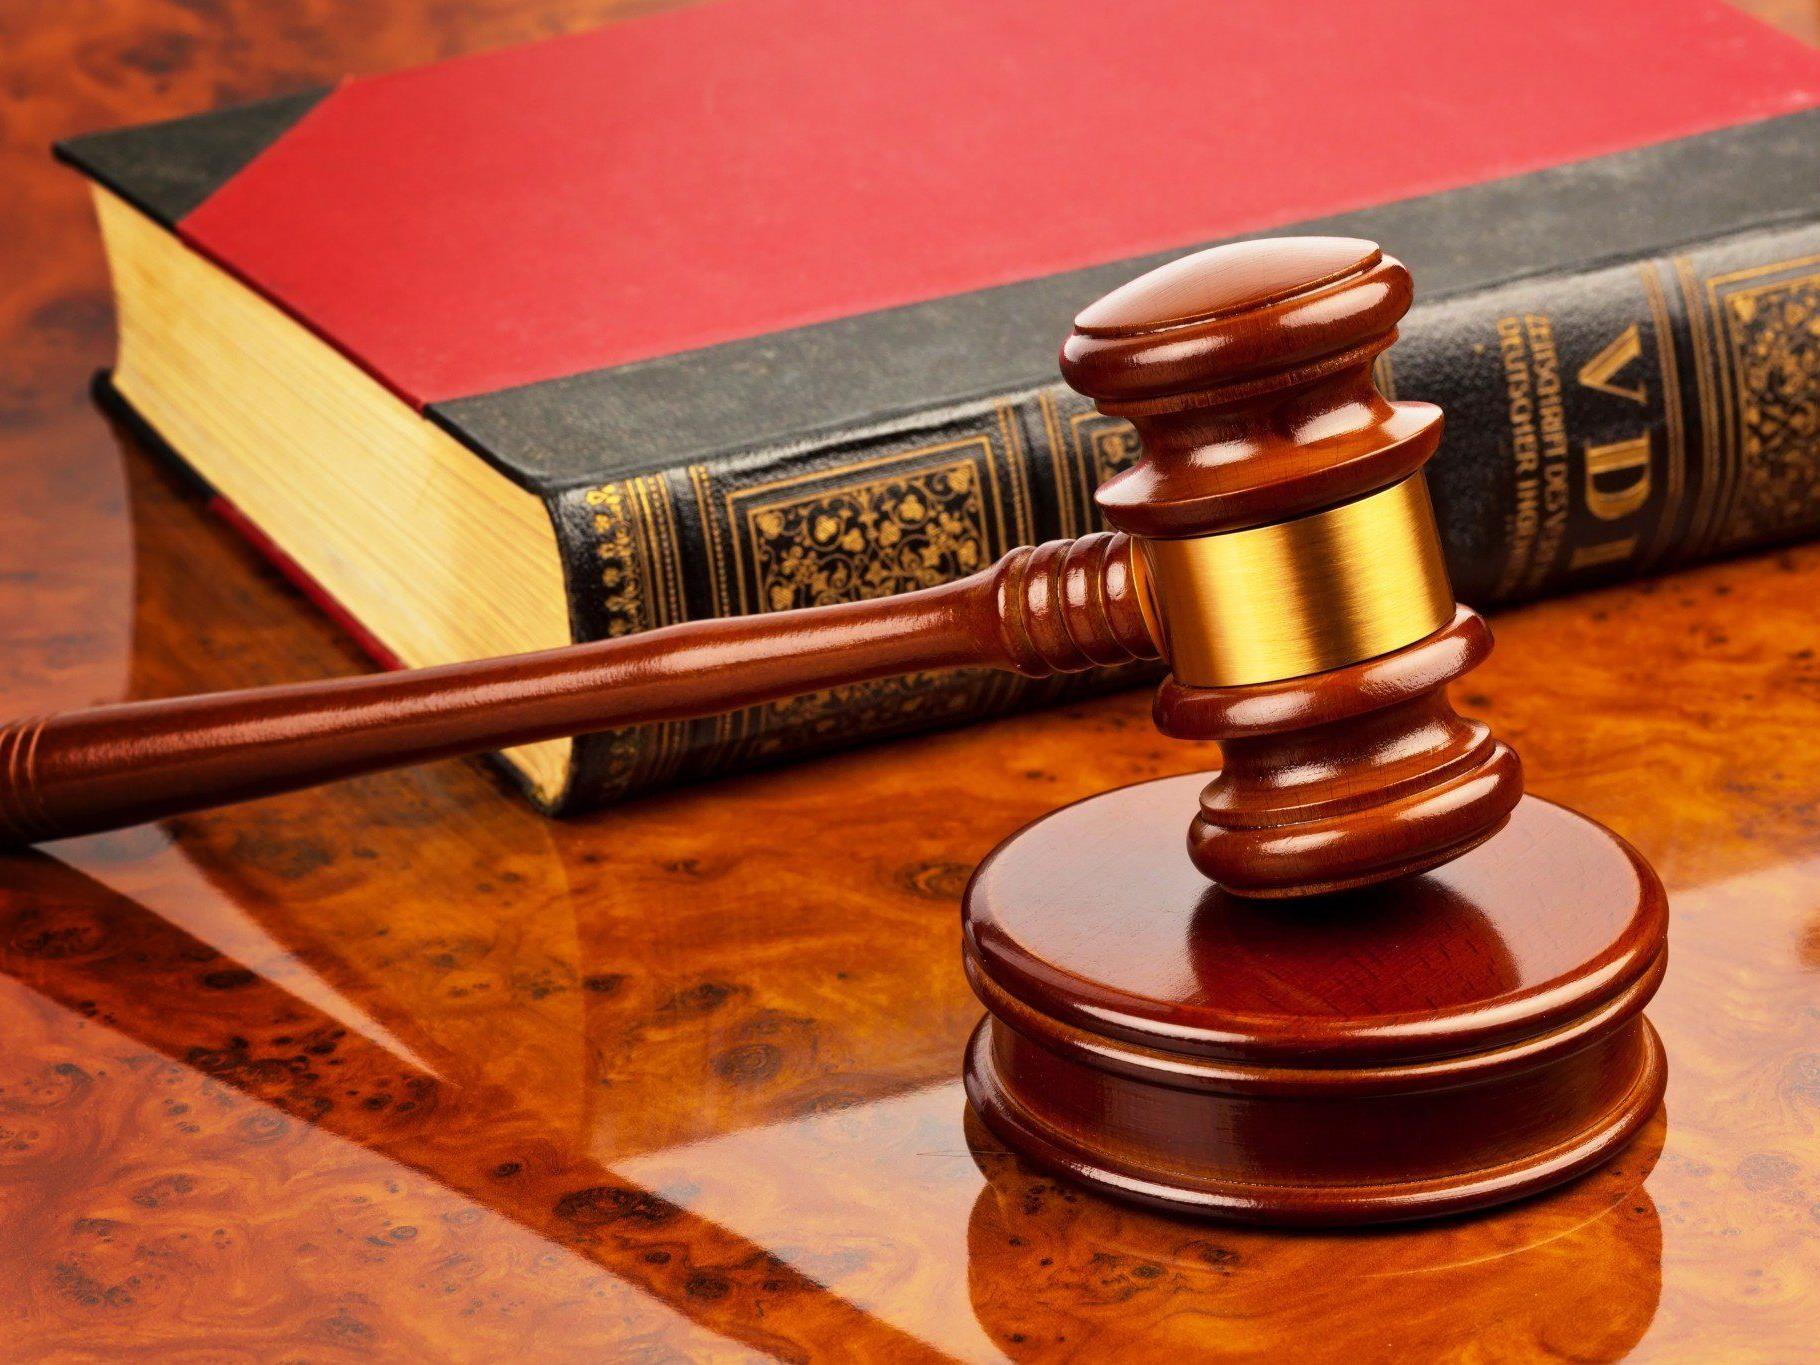 15 Monate teilbedingt für Ex-NVP-Funktionär, Freundin freigesprochen.